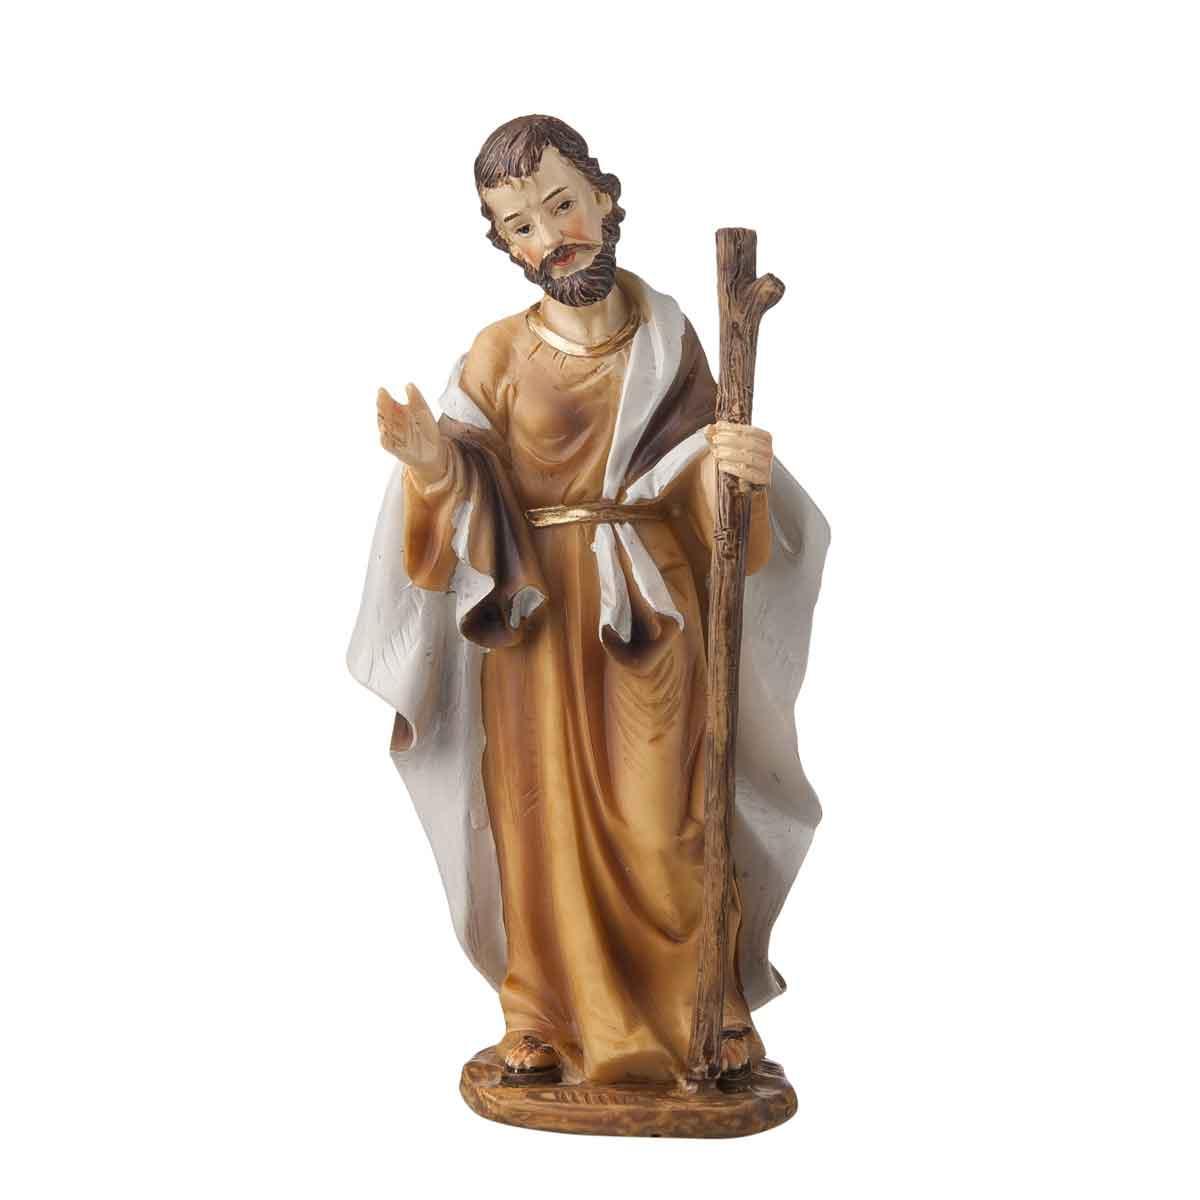 Presepe – Statuetta San Giuseppe altezza 15cm